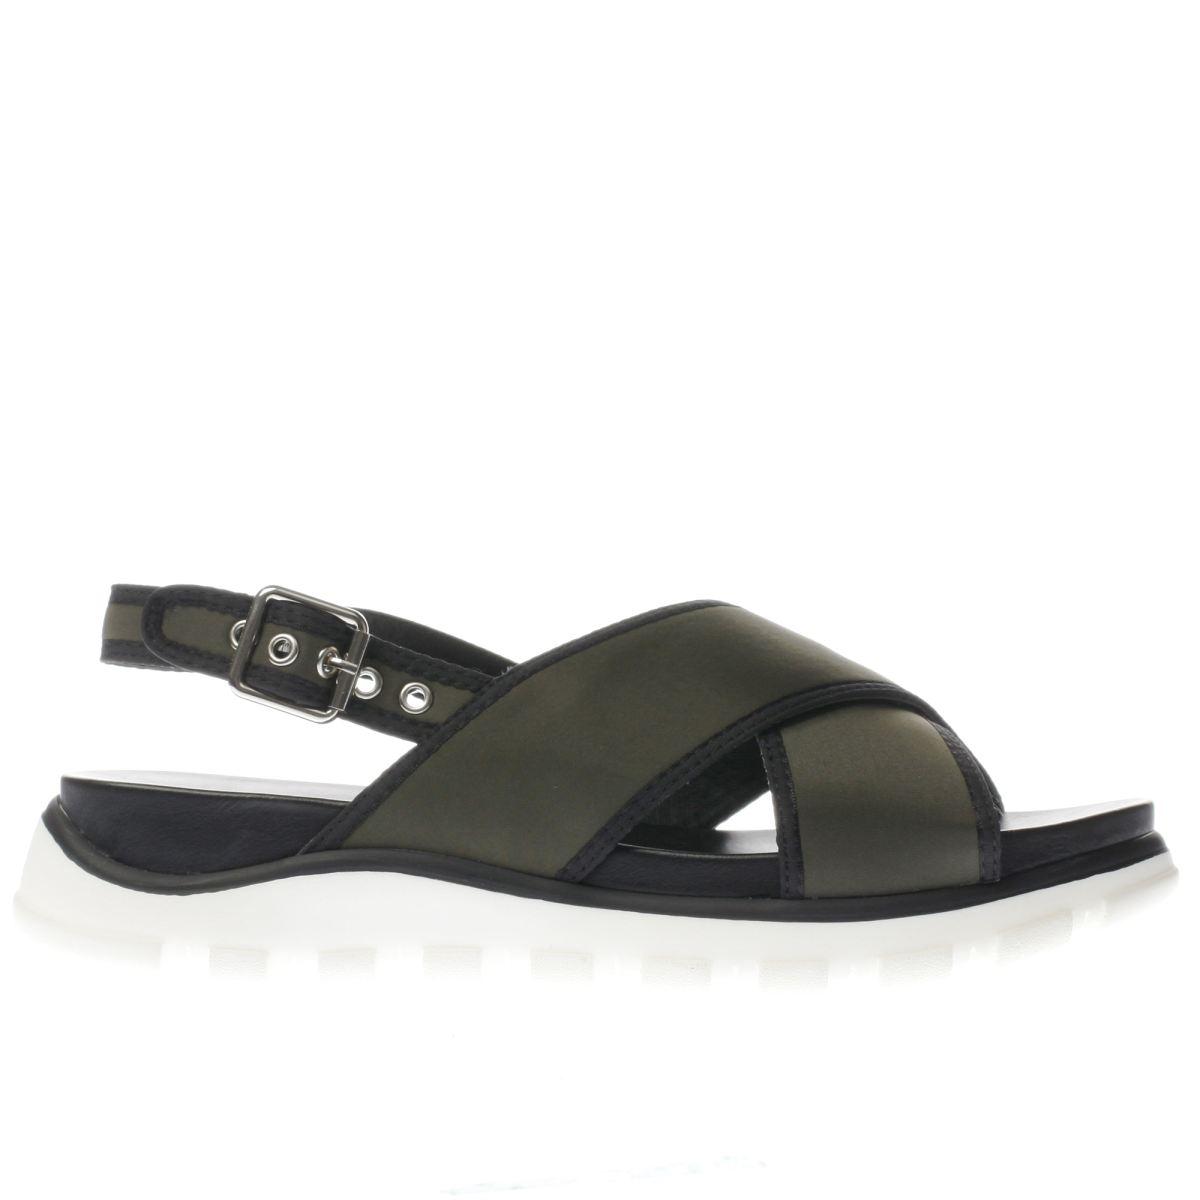 schuh khaki sunscreen sandals